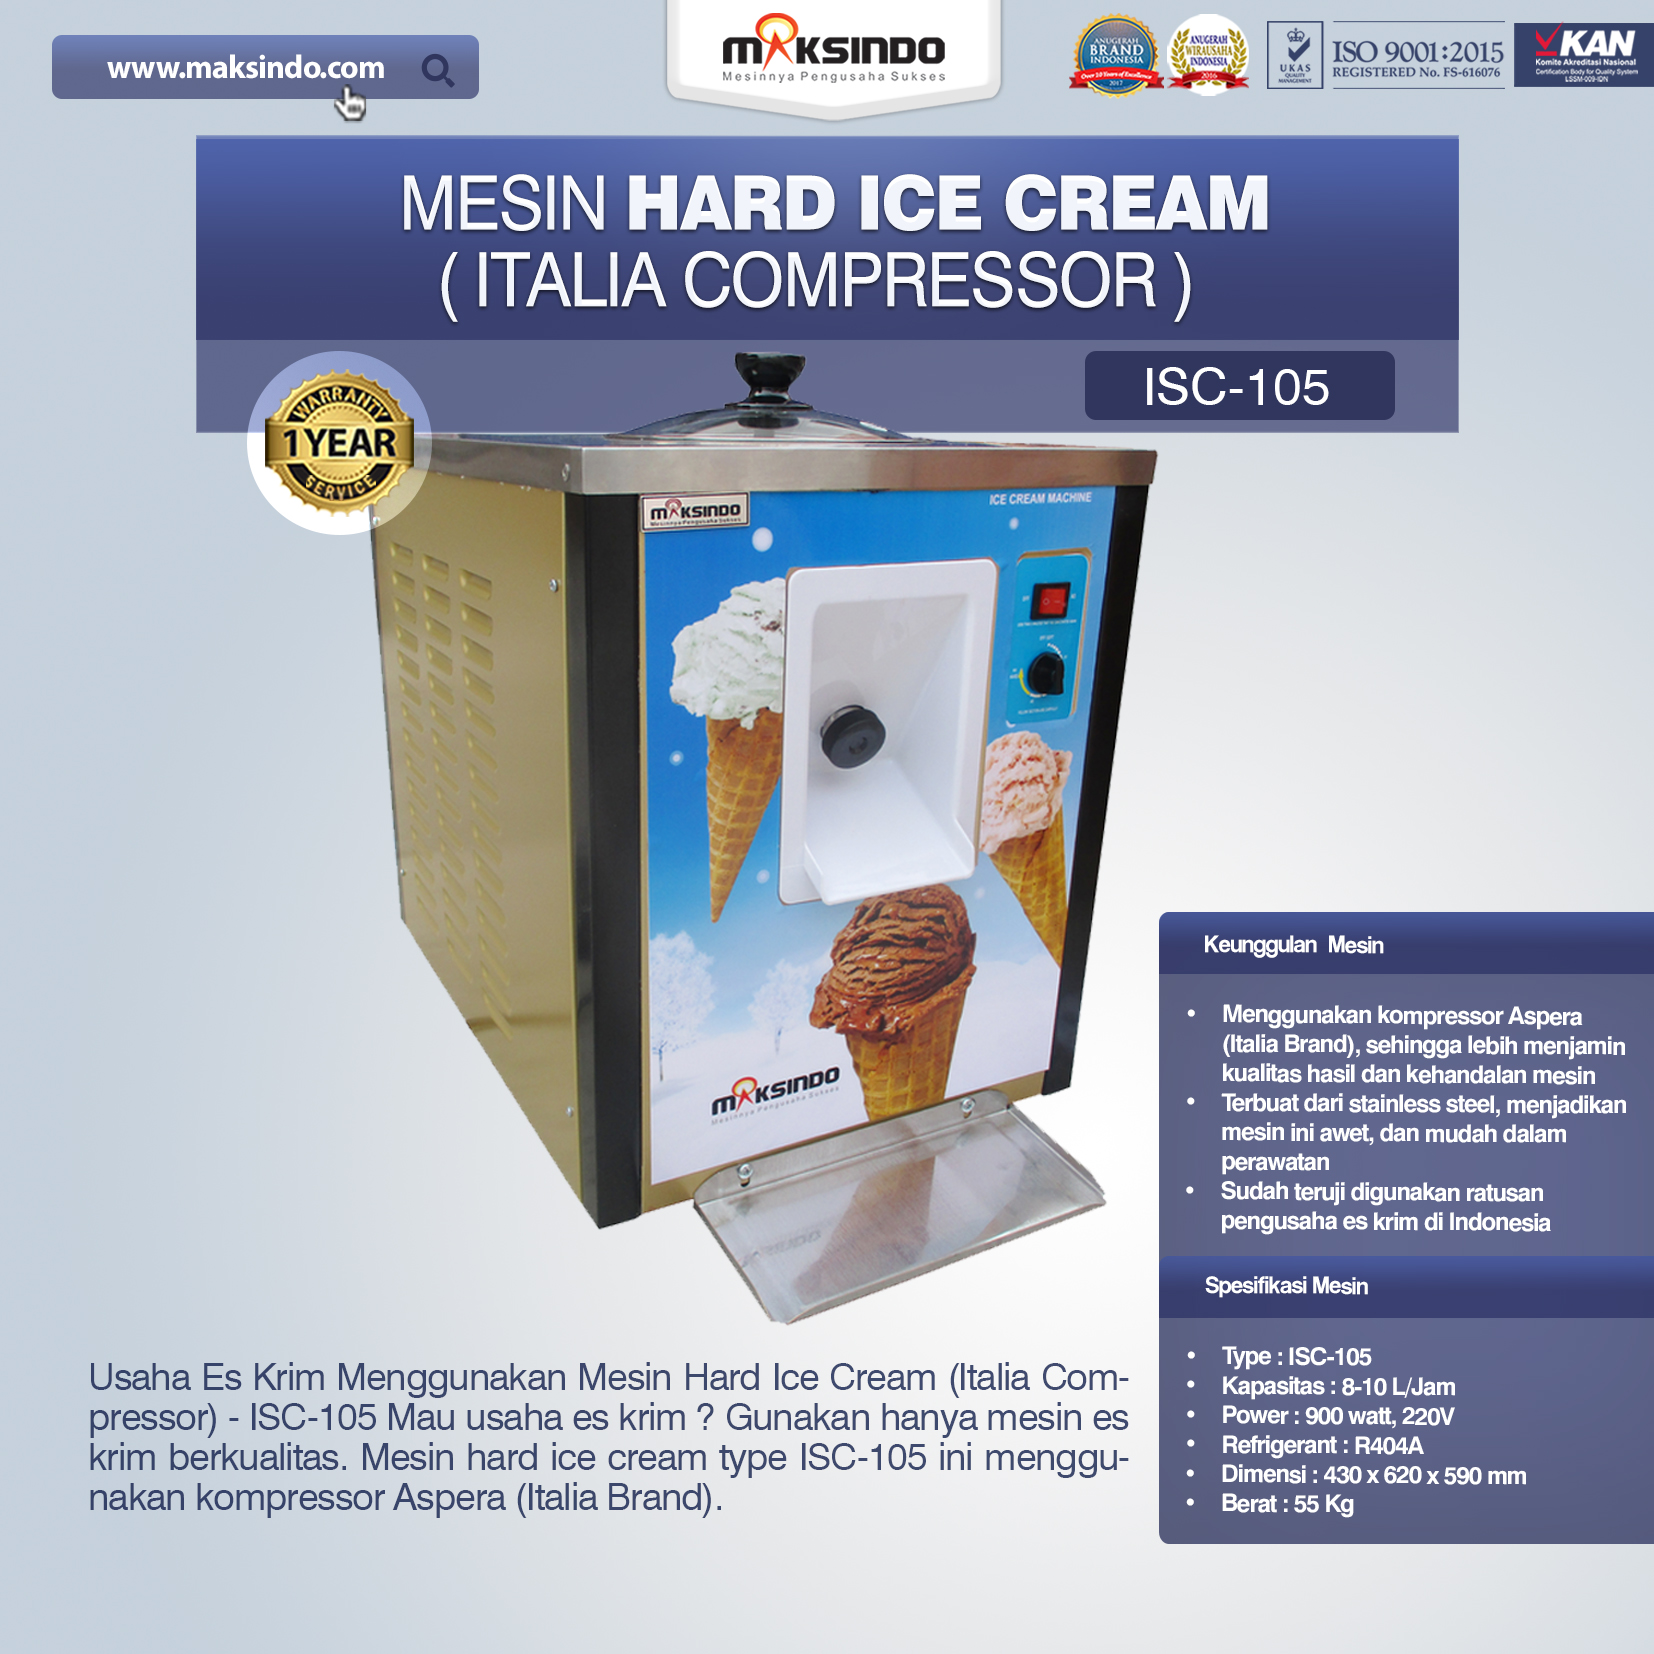 jual Mesin Hard Ice Cream (Italia Compressor) – ISC-105 di Bali